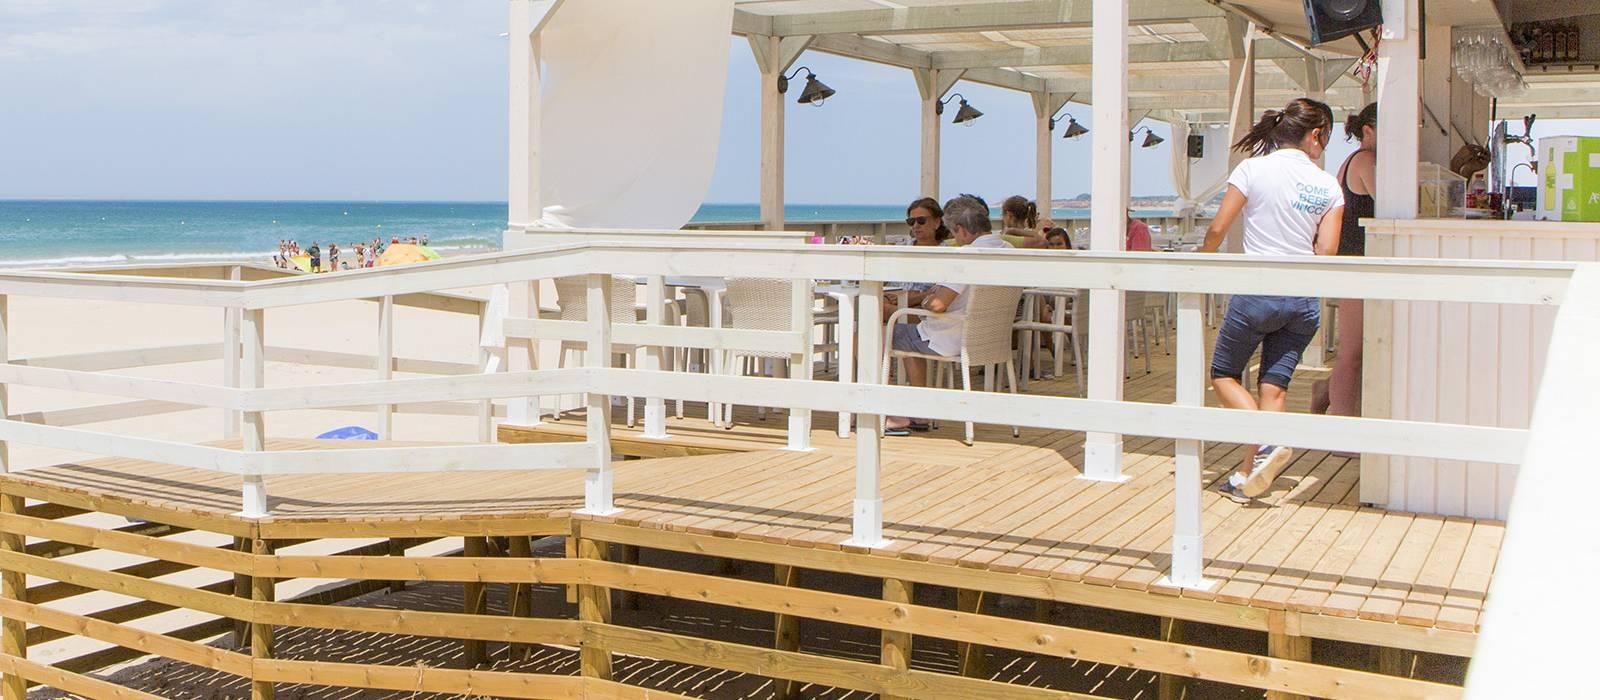 Bar sur la plage Costa Golf - Hotel Vincci Costa Golf